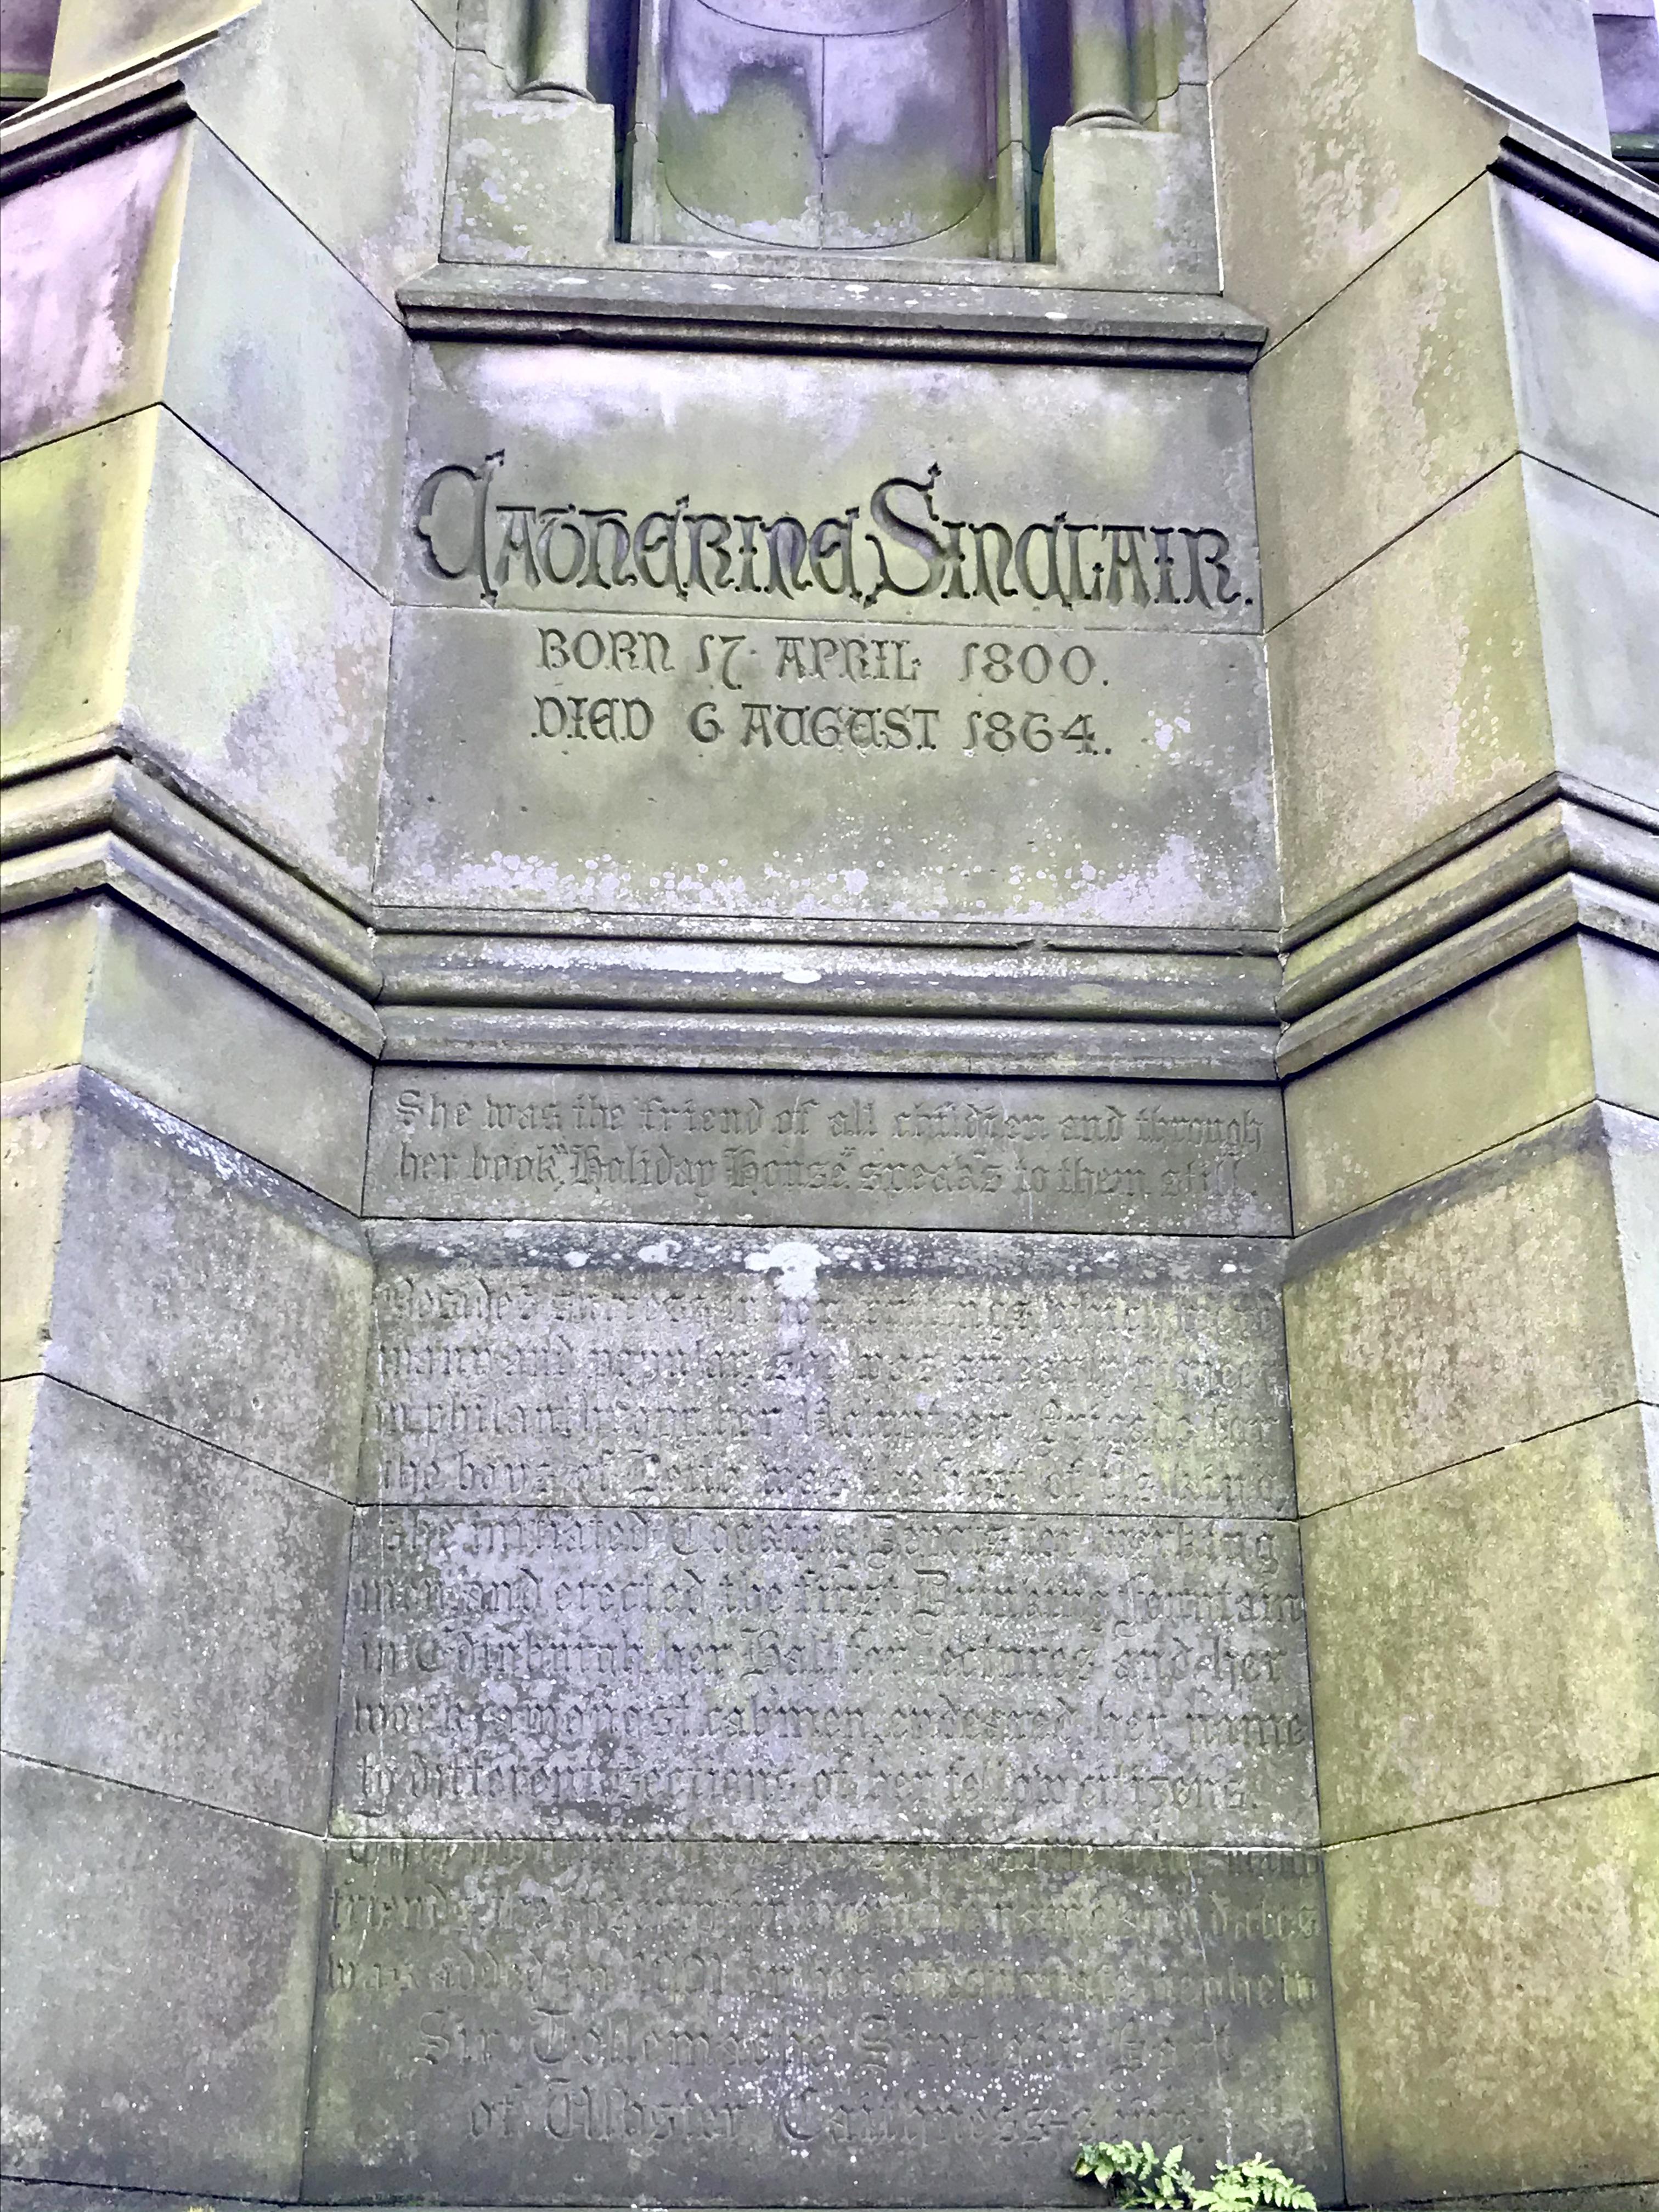 Catherine Sinclair 1800 - 1864